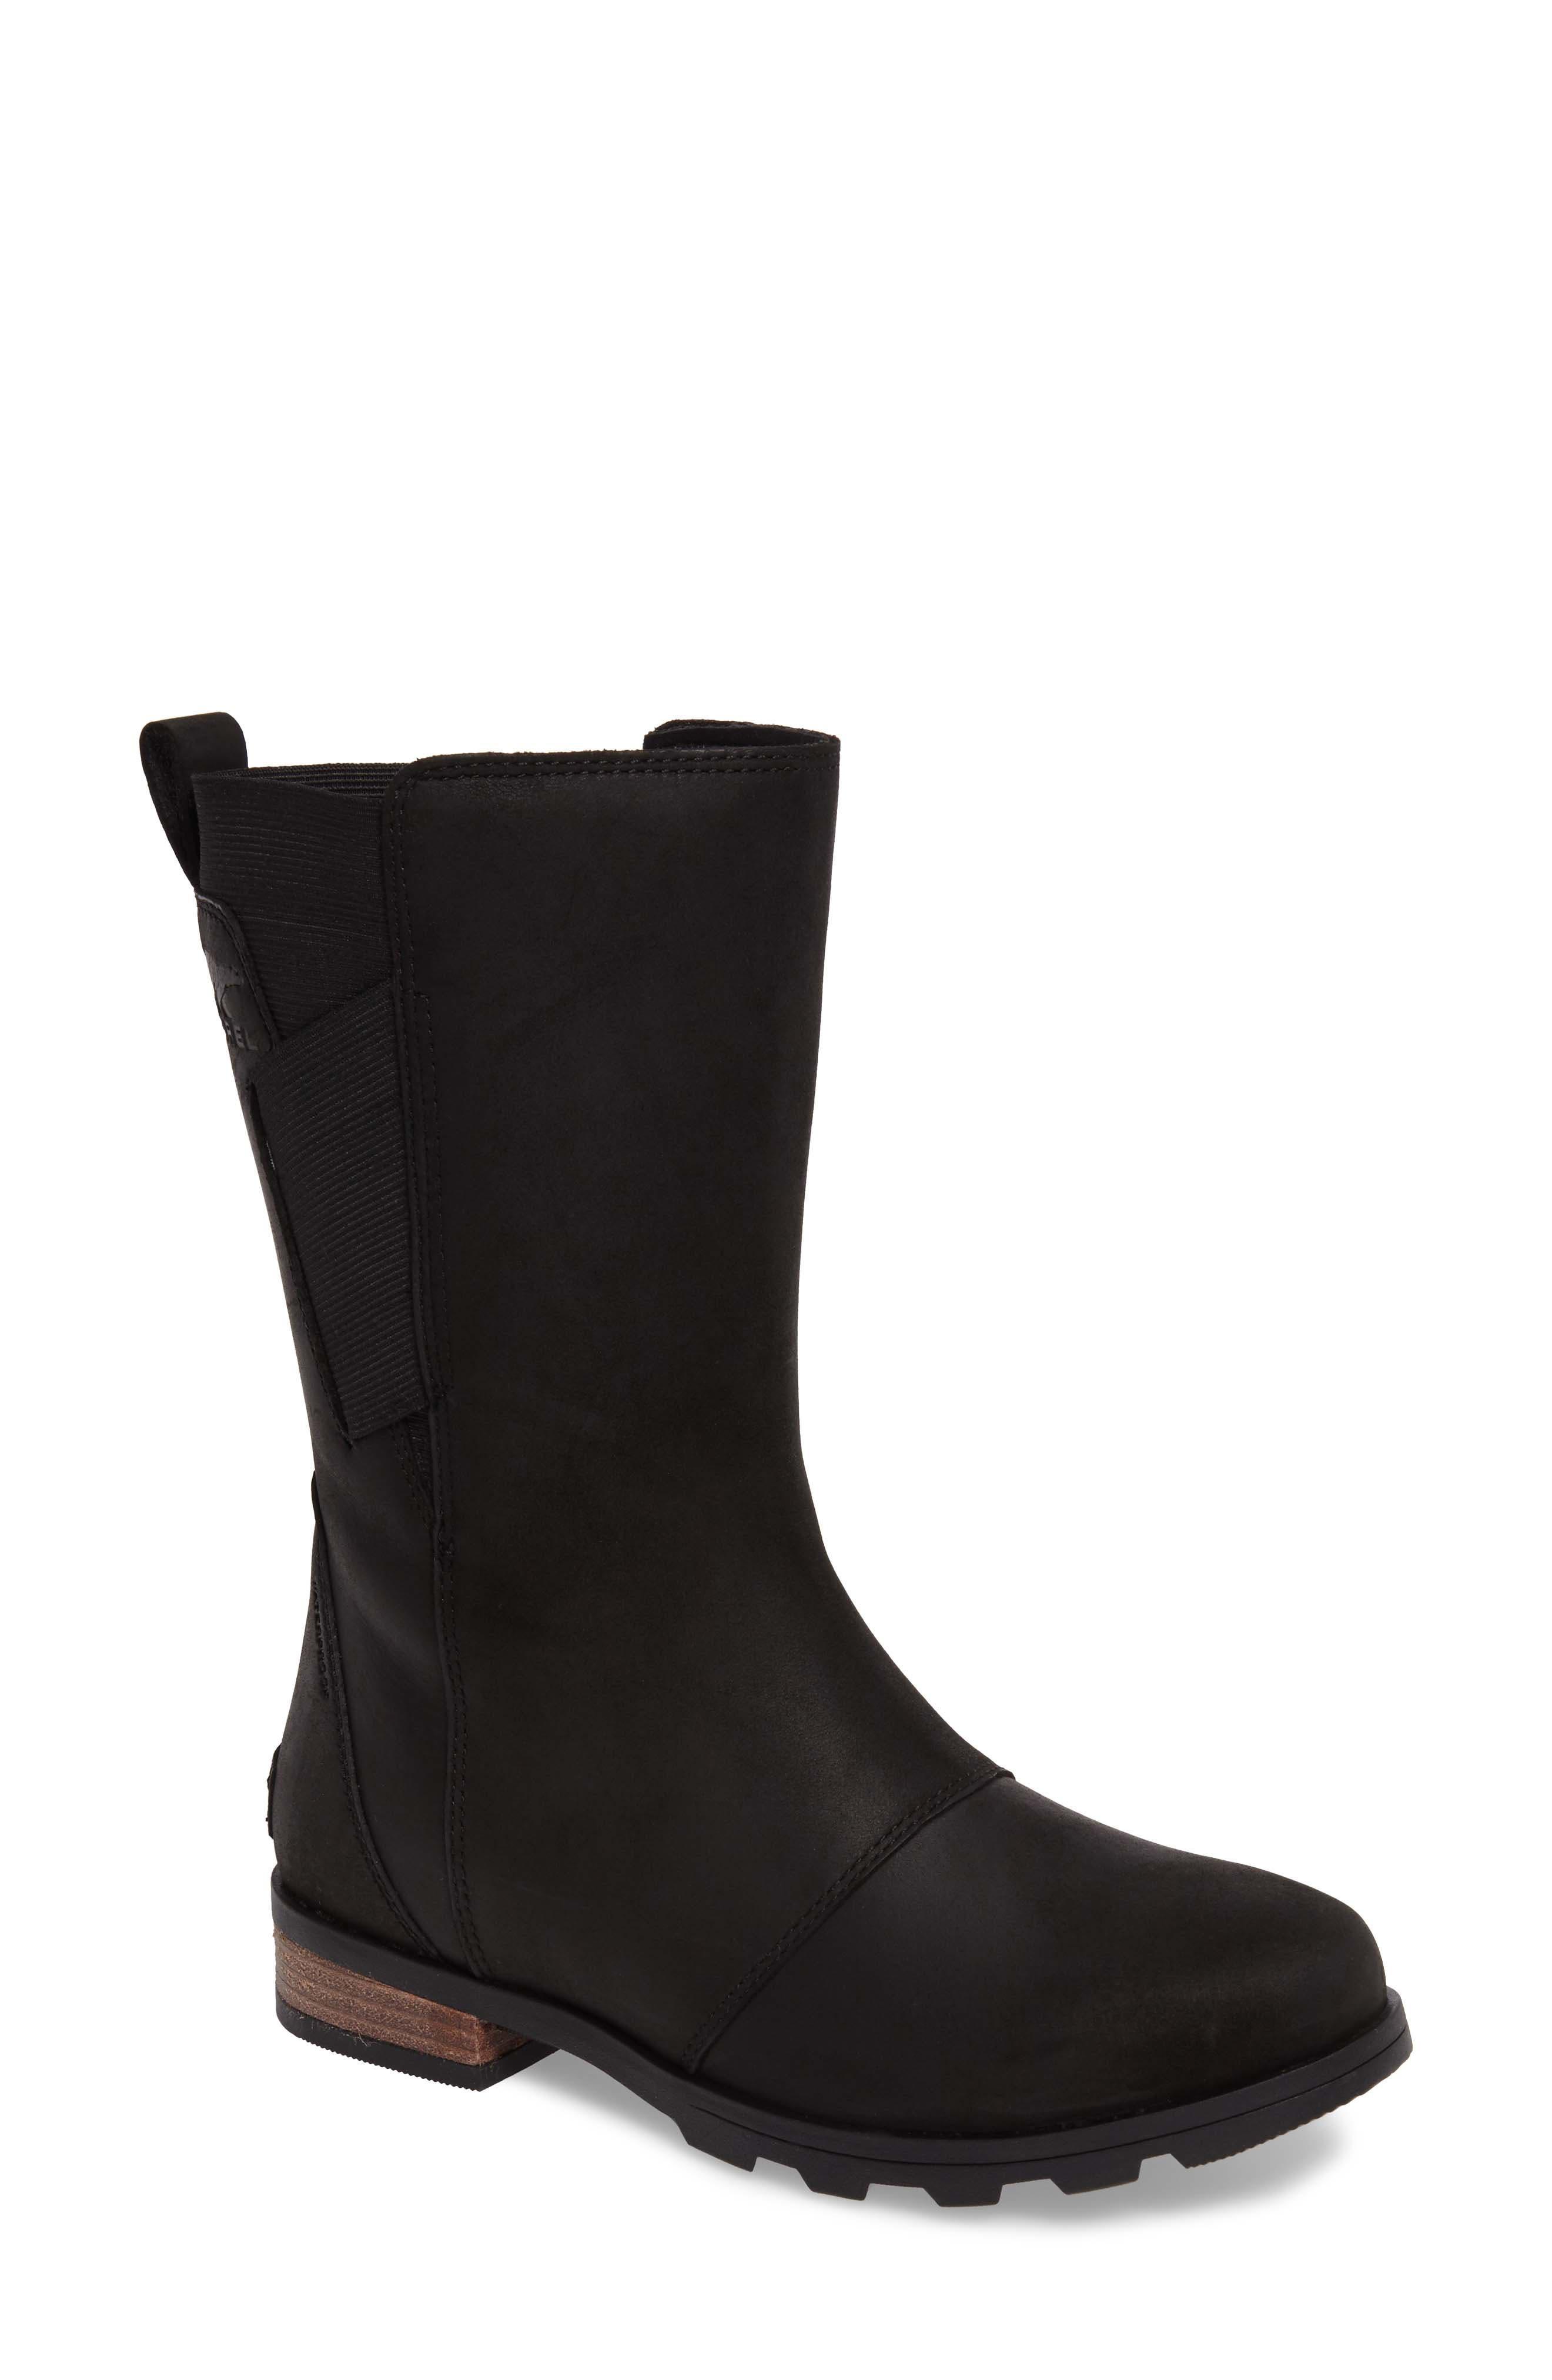 Emelie Waterproof Boot,                             Main thumbnail 1, color,                             Black